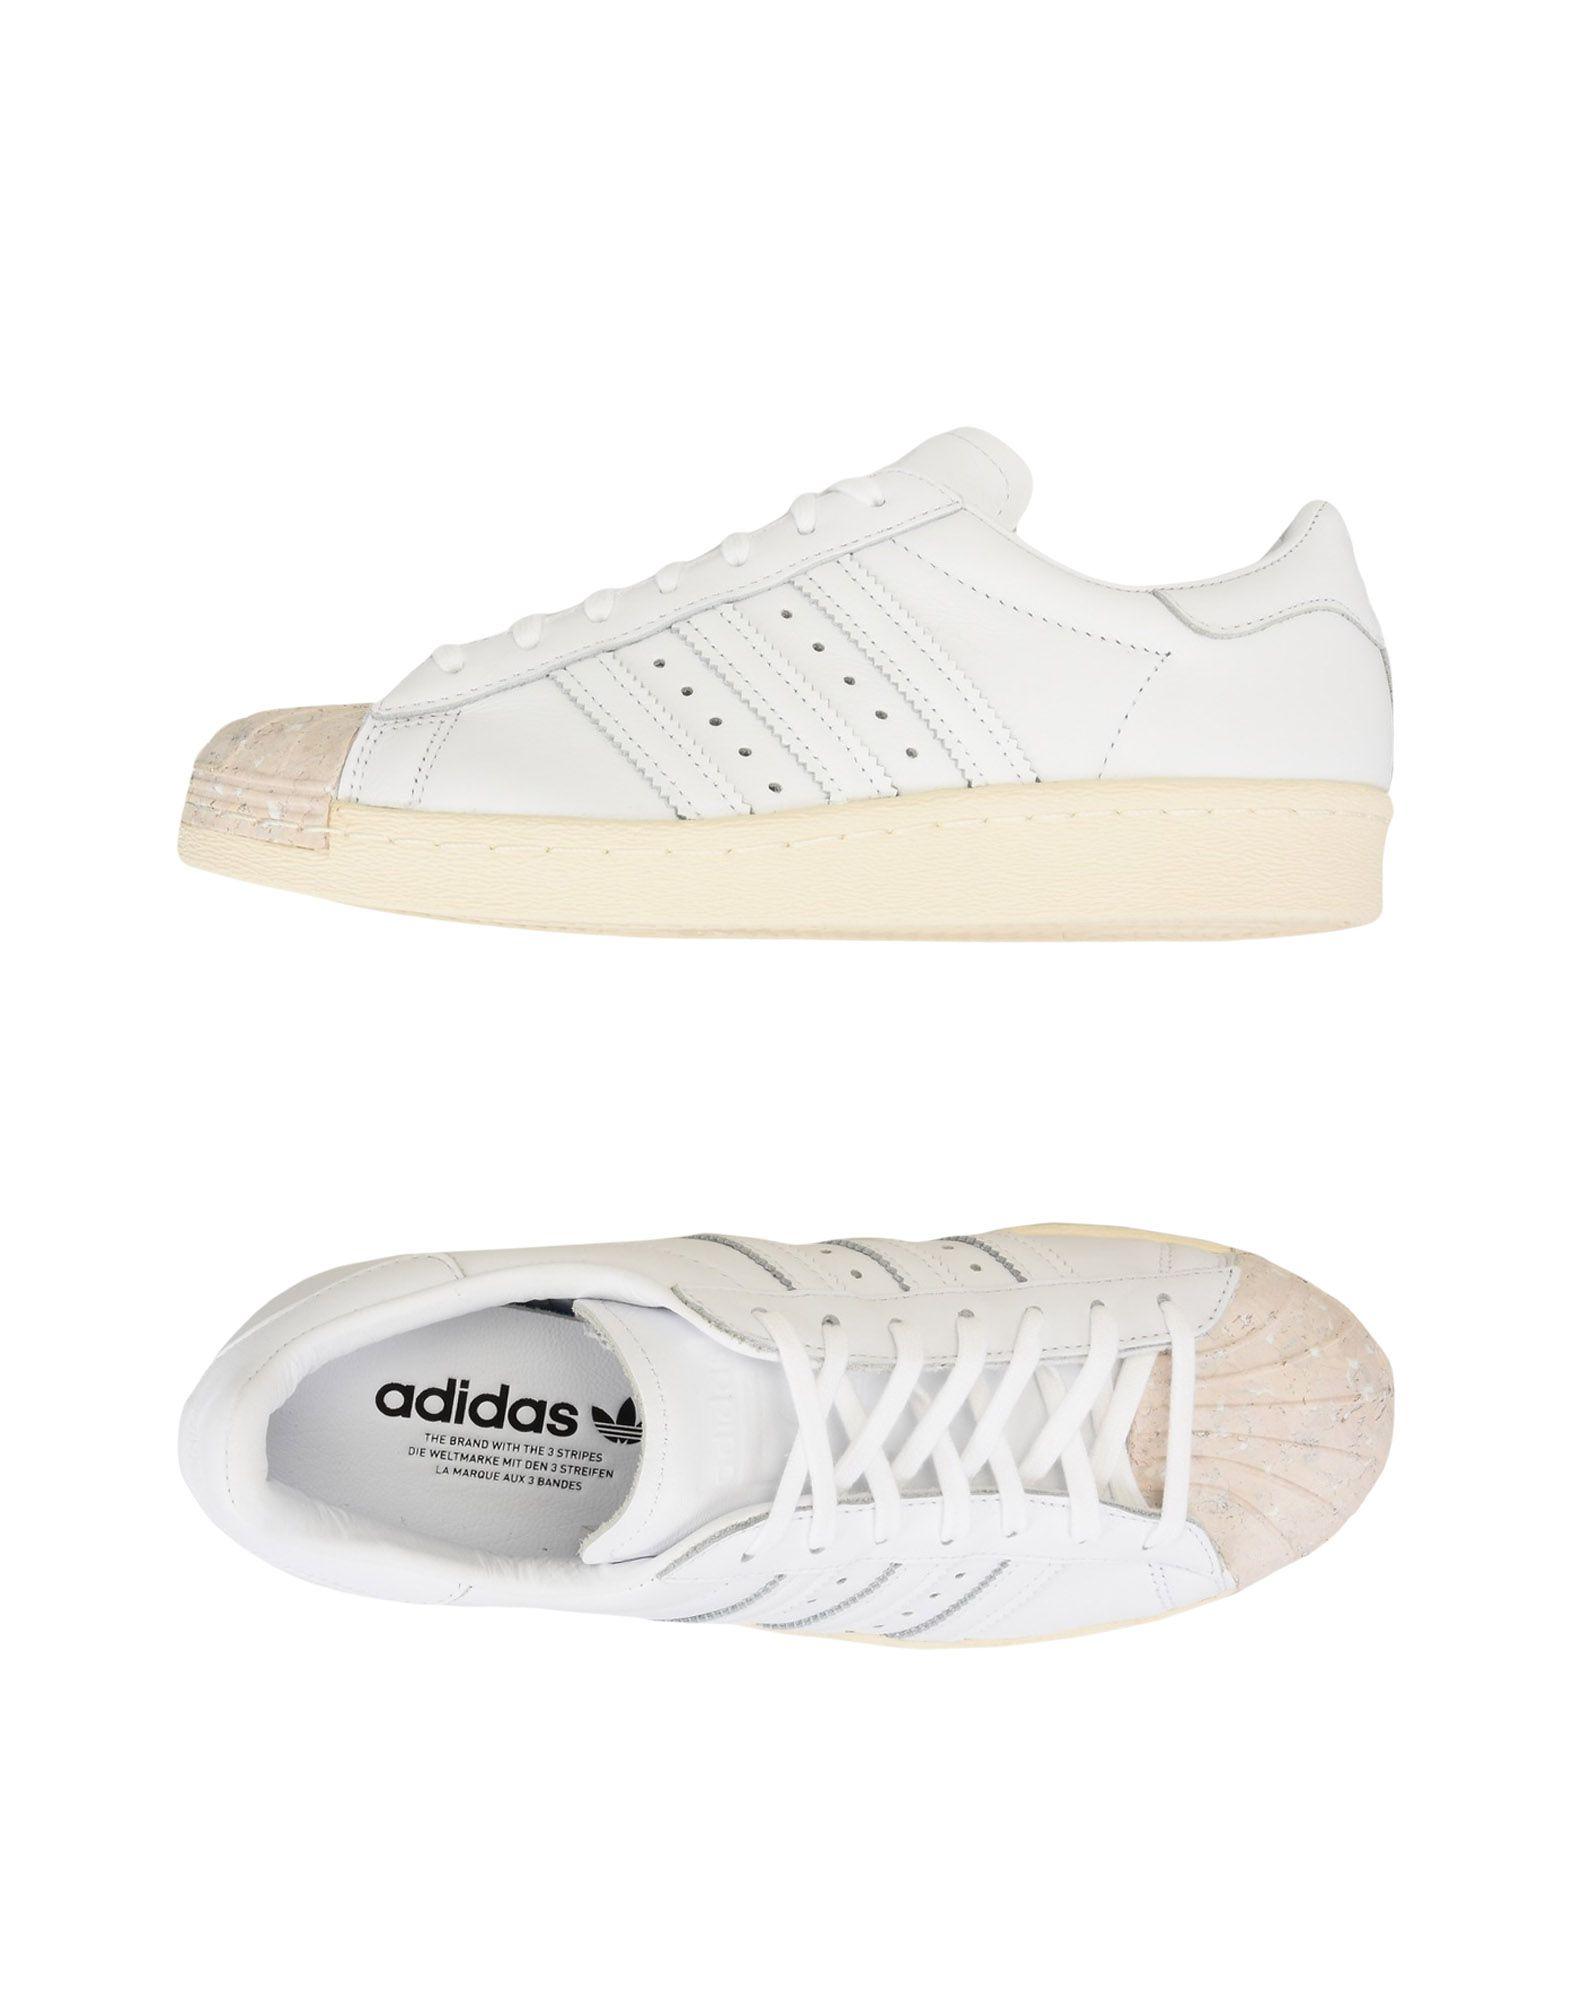 ADIDAS ORIGINALS Низкие кеды и кроссовки adidas originals superstar stormtrooper j lifestyle basketball shoe big kid